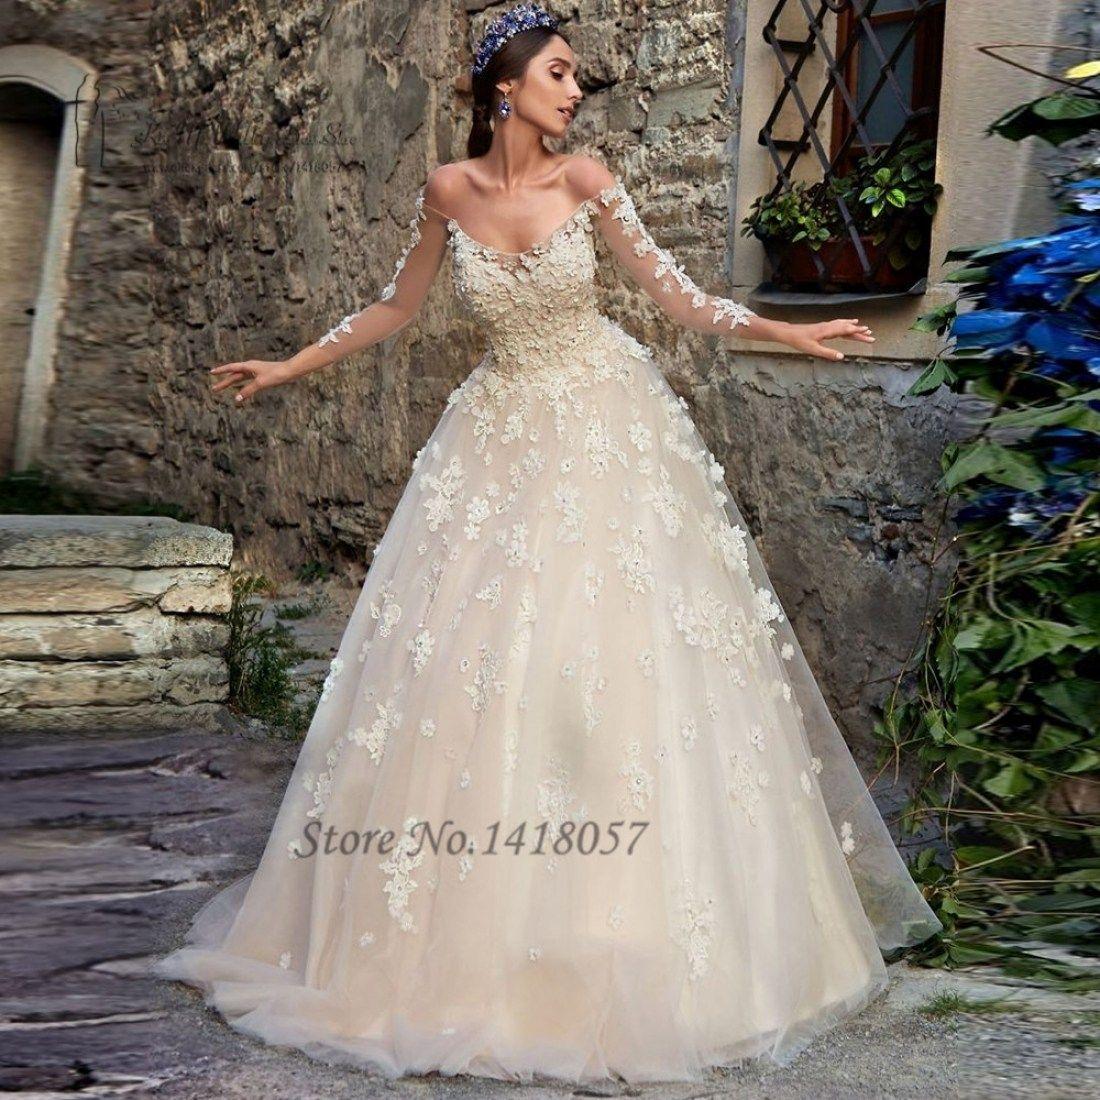 30 beautiful white wedding dress with black flowers wedding vintage boho wedding dress lace flowers crystals princess wedding pertaining to white wedding dress with black flowers mightylinksfo